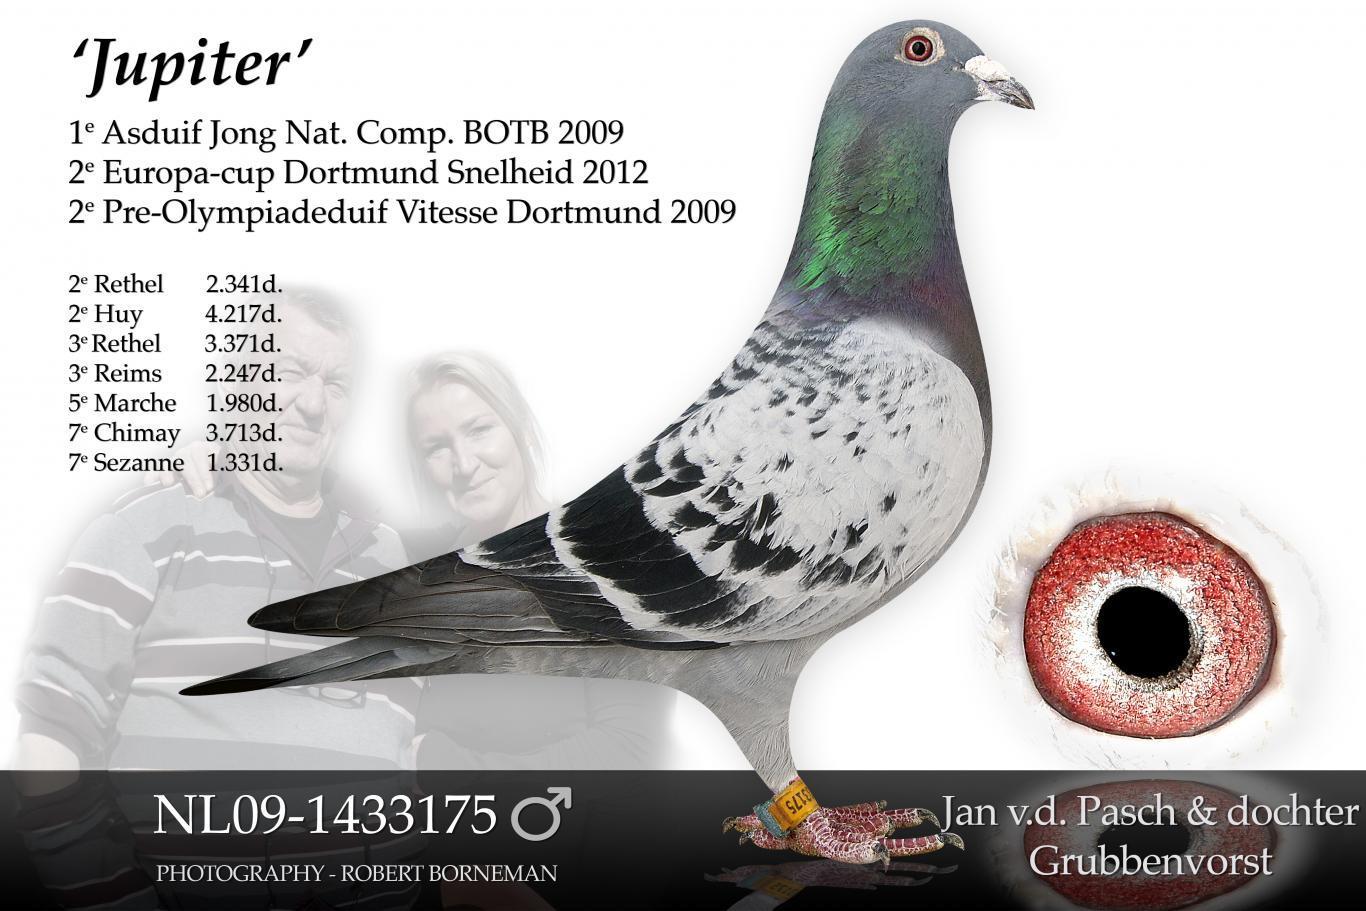 NL09-1433175